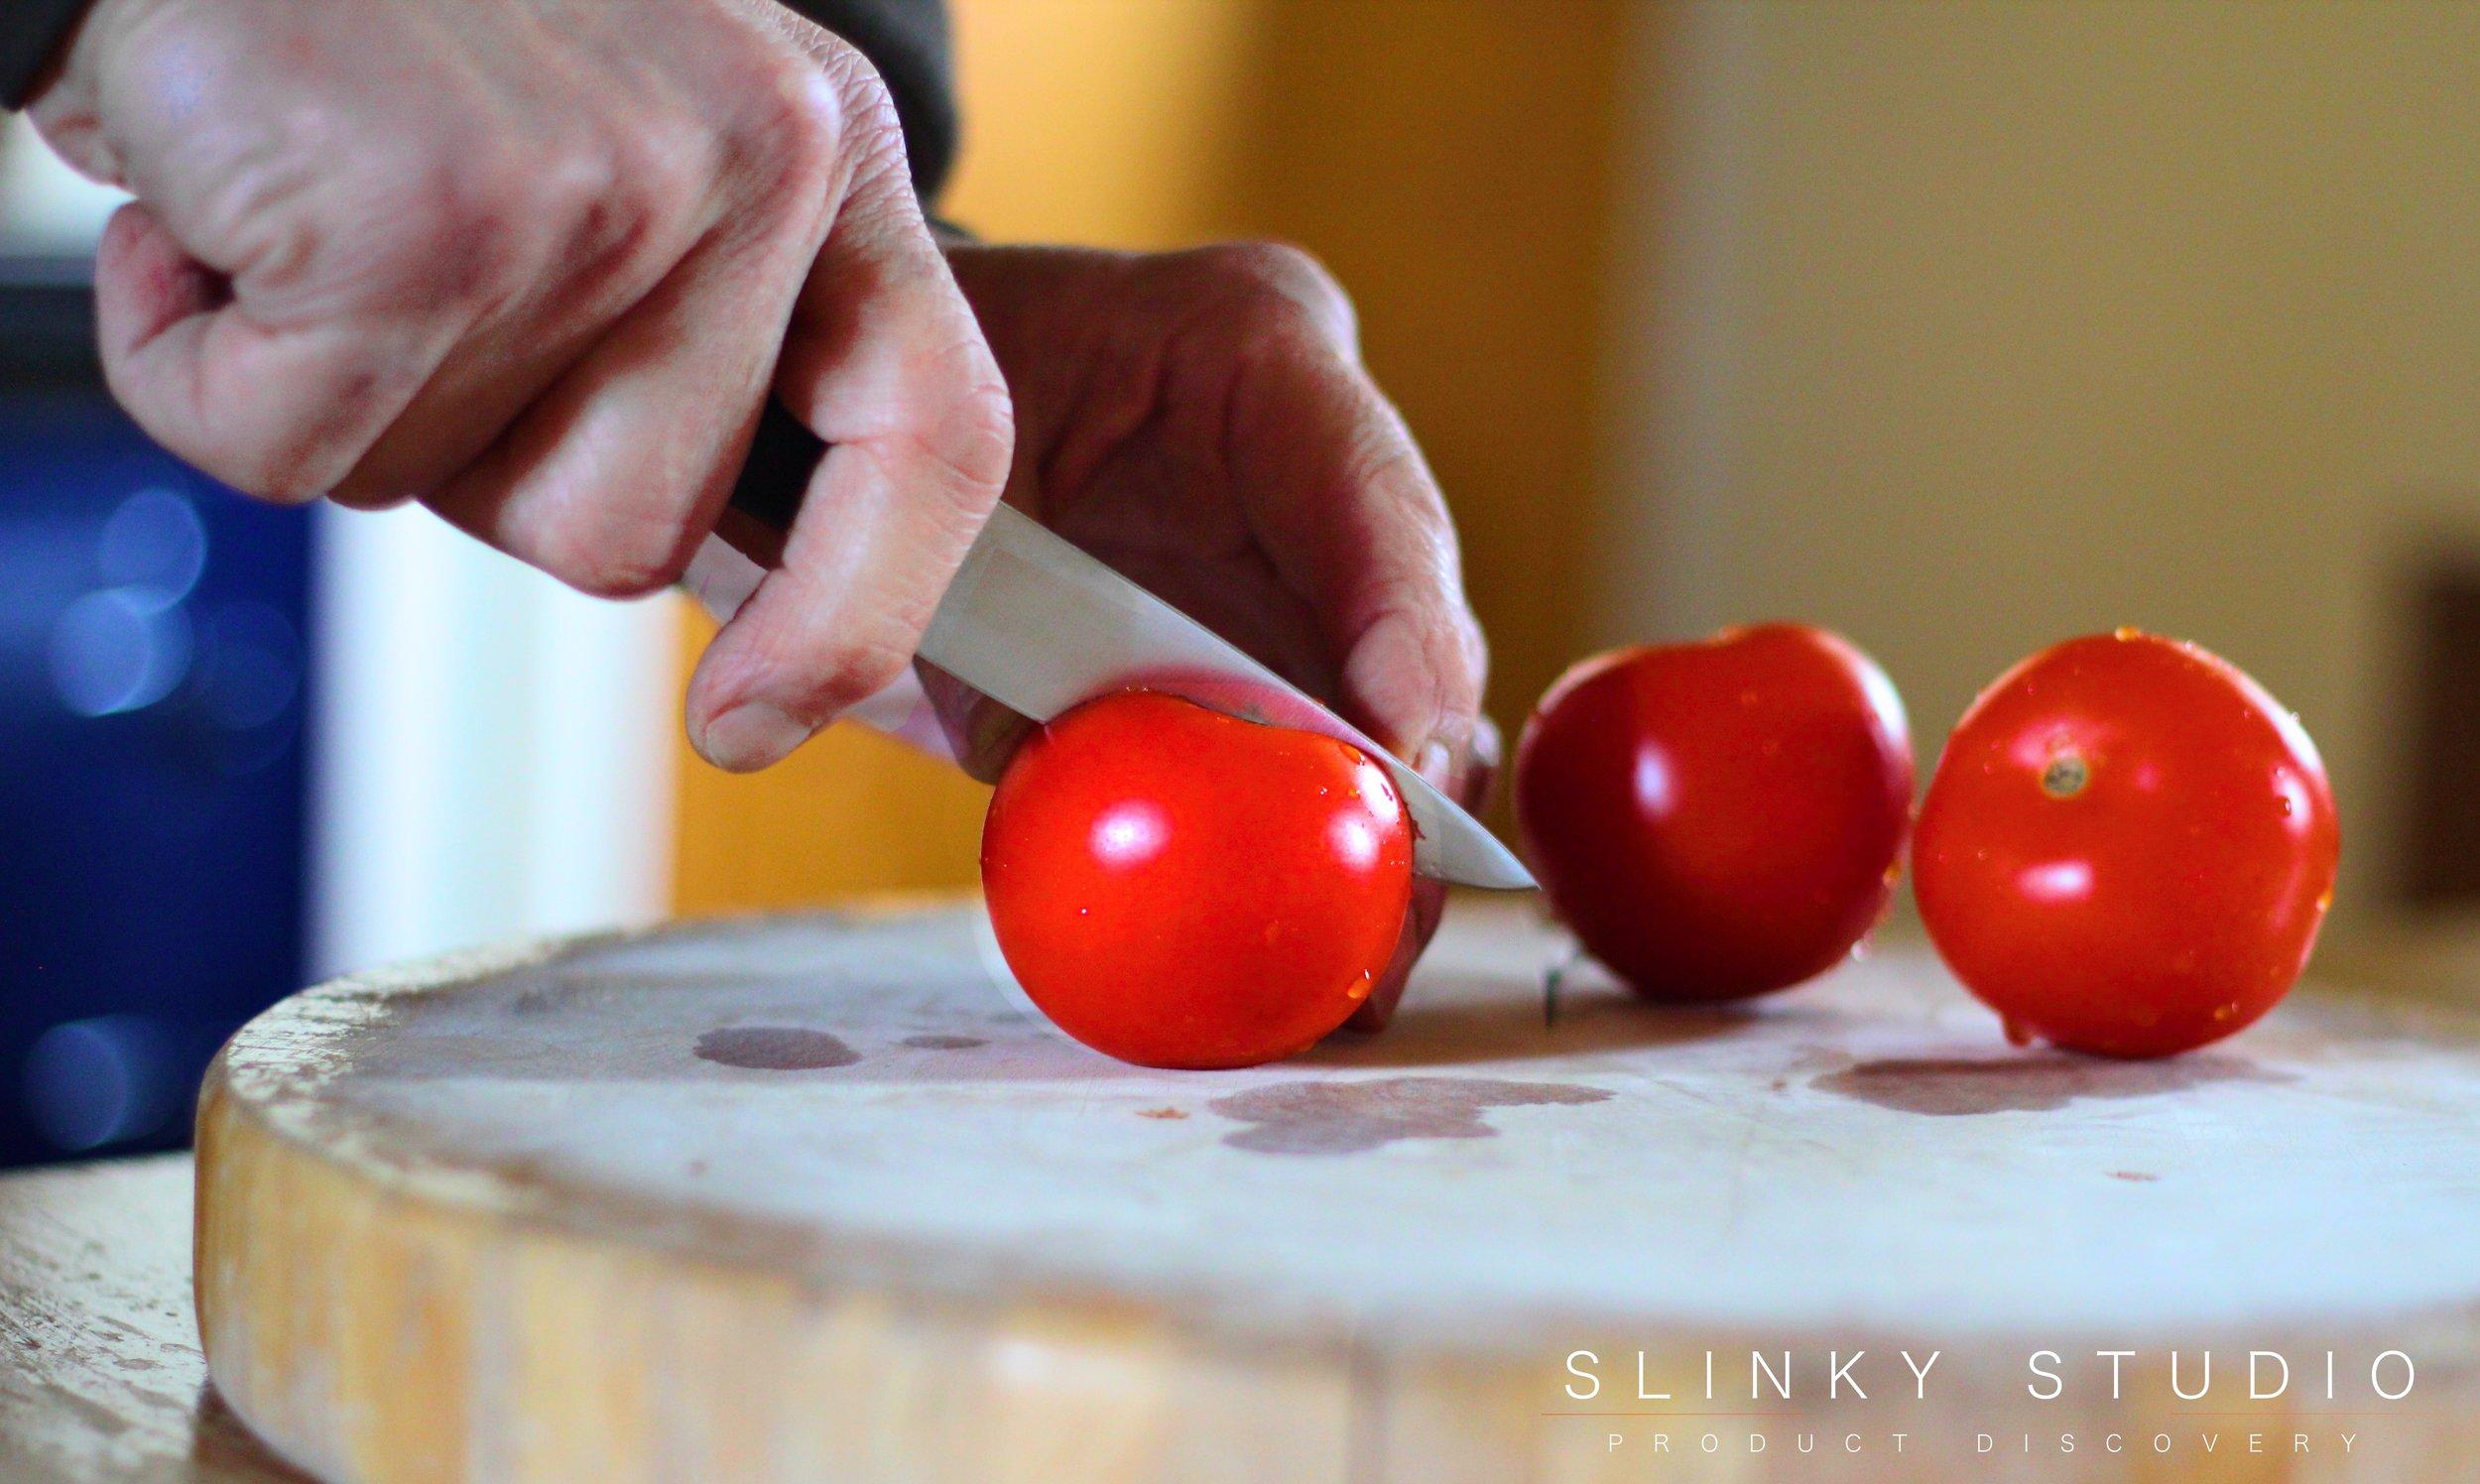 KitchenAid 7pc Professional Series Knife Set Pairing Knife Slicing Tomatoes.jpg